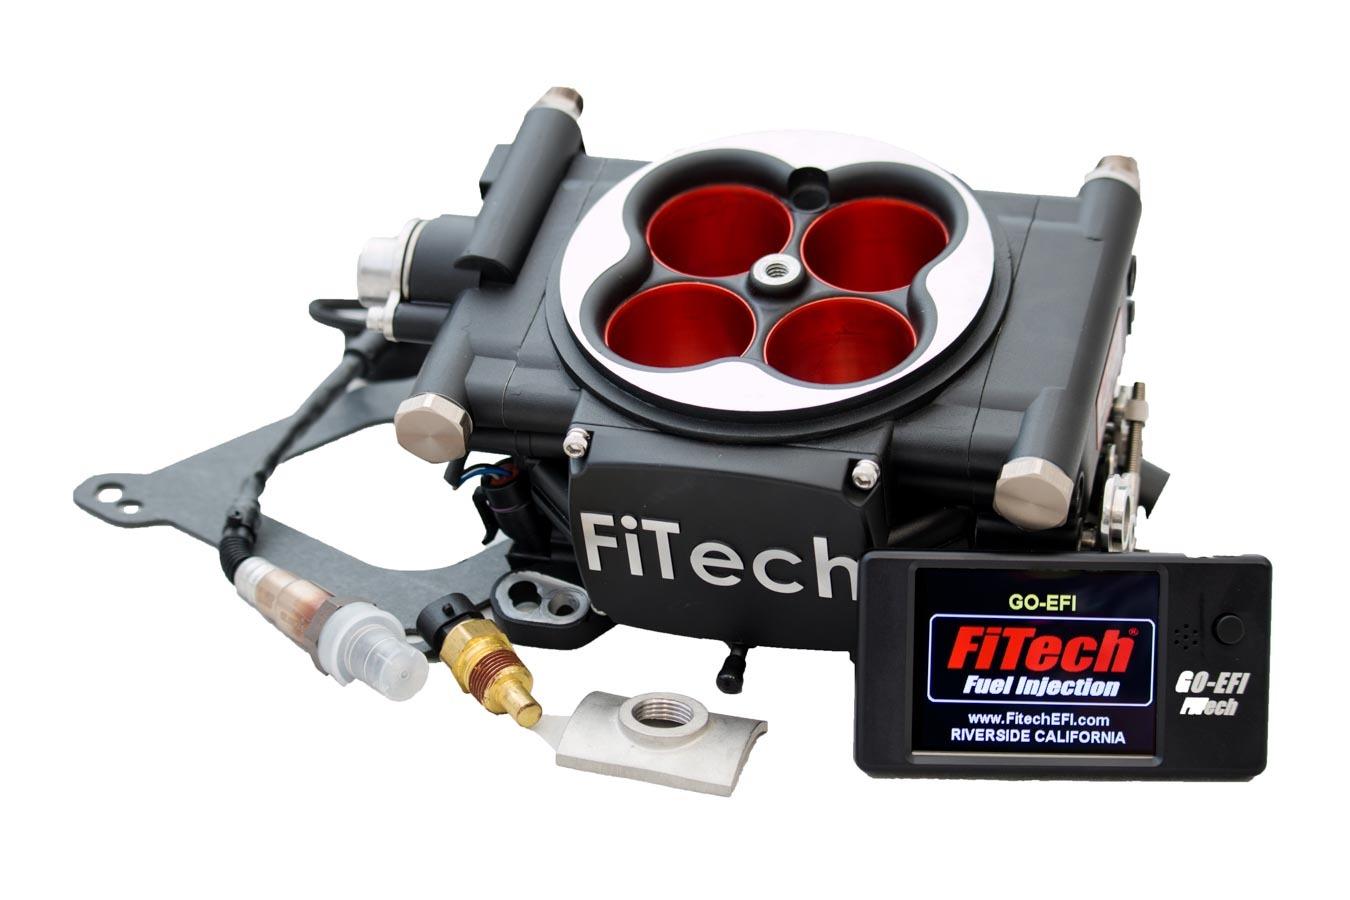 Fitech Fuel Injection 30004 Fuel Injection, Go EFI 4 Power Adder, Throttle Body, Square Bore, 70 lb/hr Injectors, Nitrous Control, Aluminum, Black Anodize, Universal, Kit